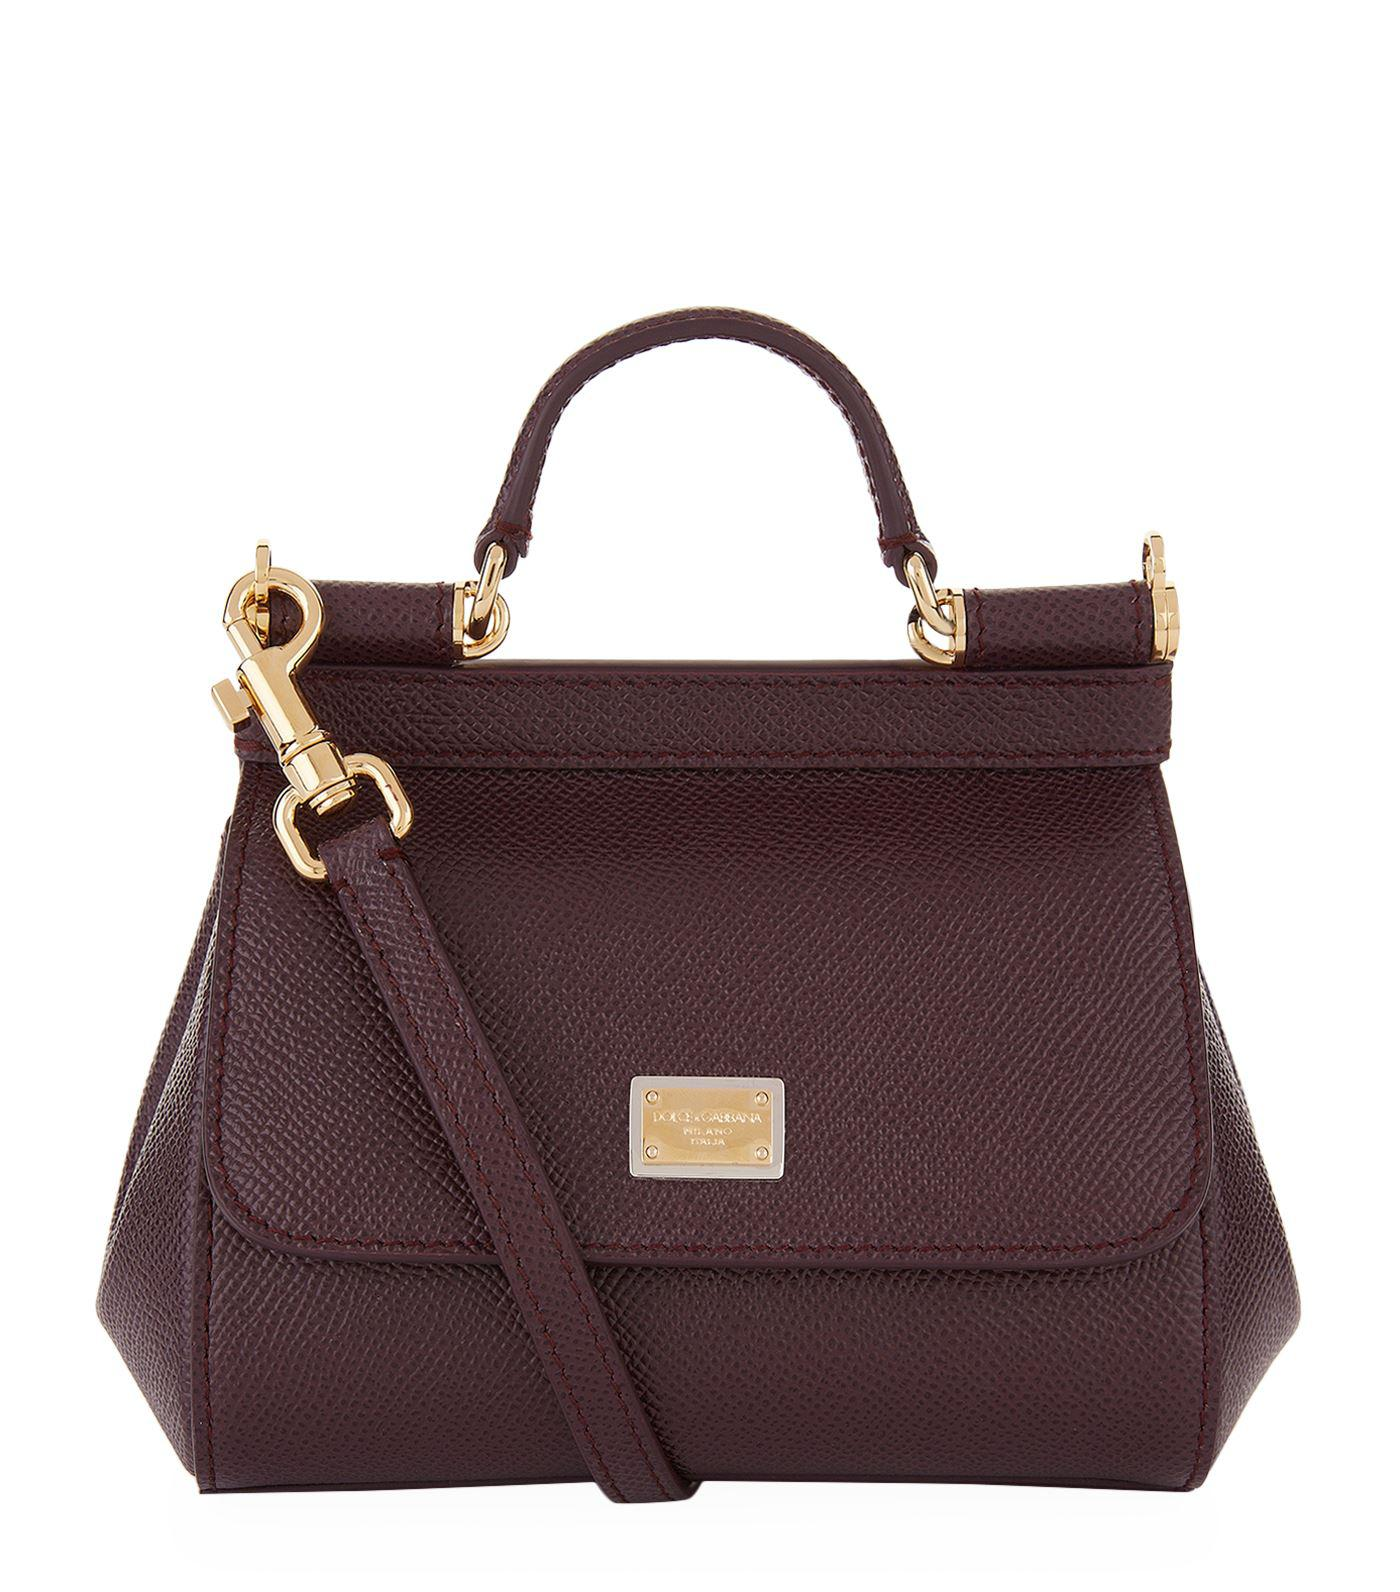 dd00d6f3ef Dolce   Gabbana Micro Sicily Top Handle Bag in Purple - Lyst